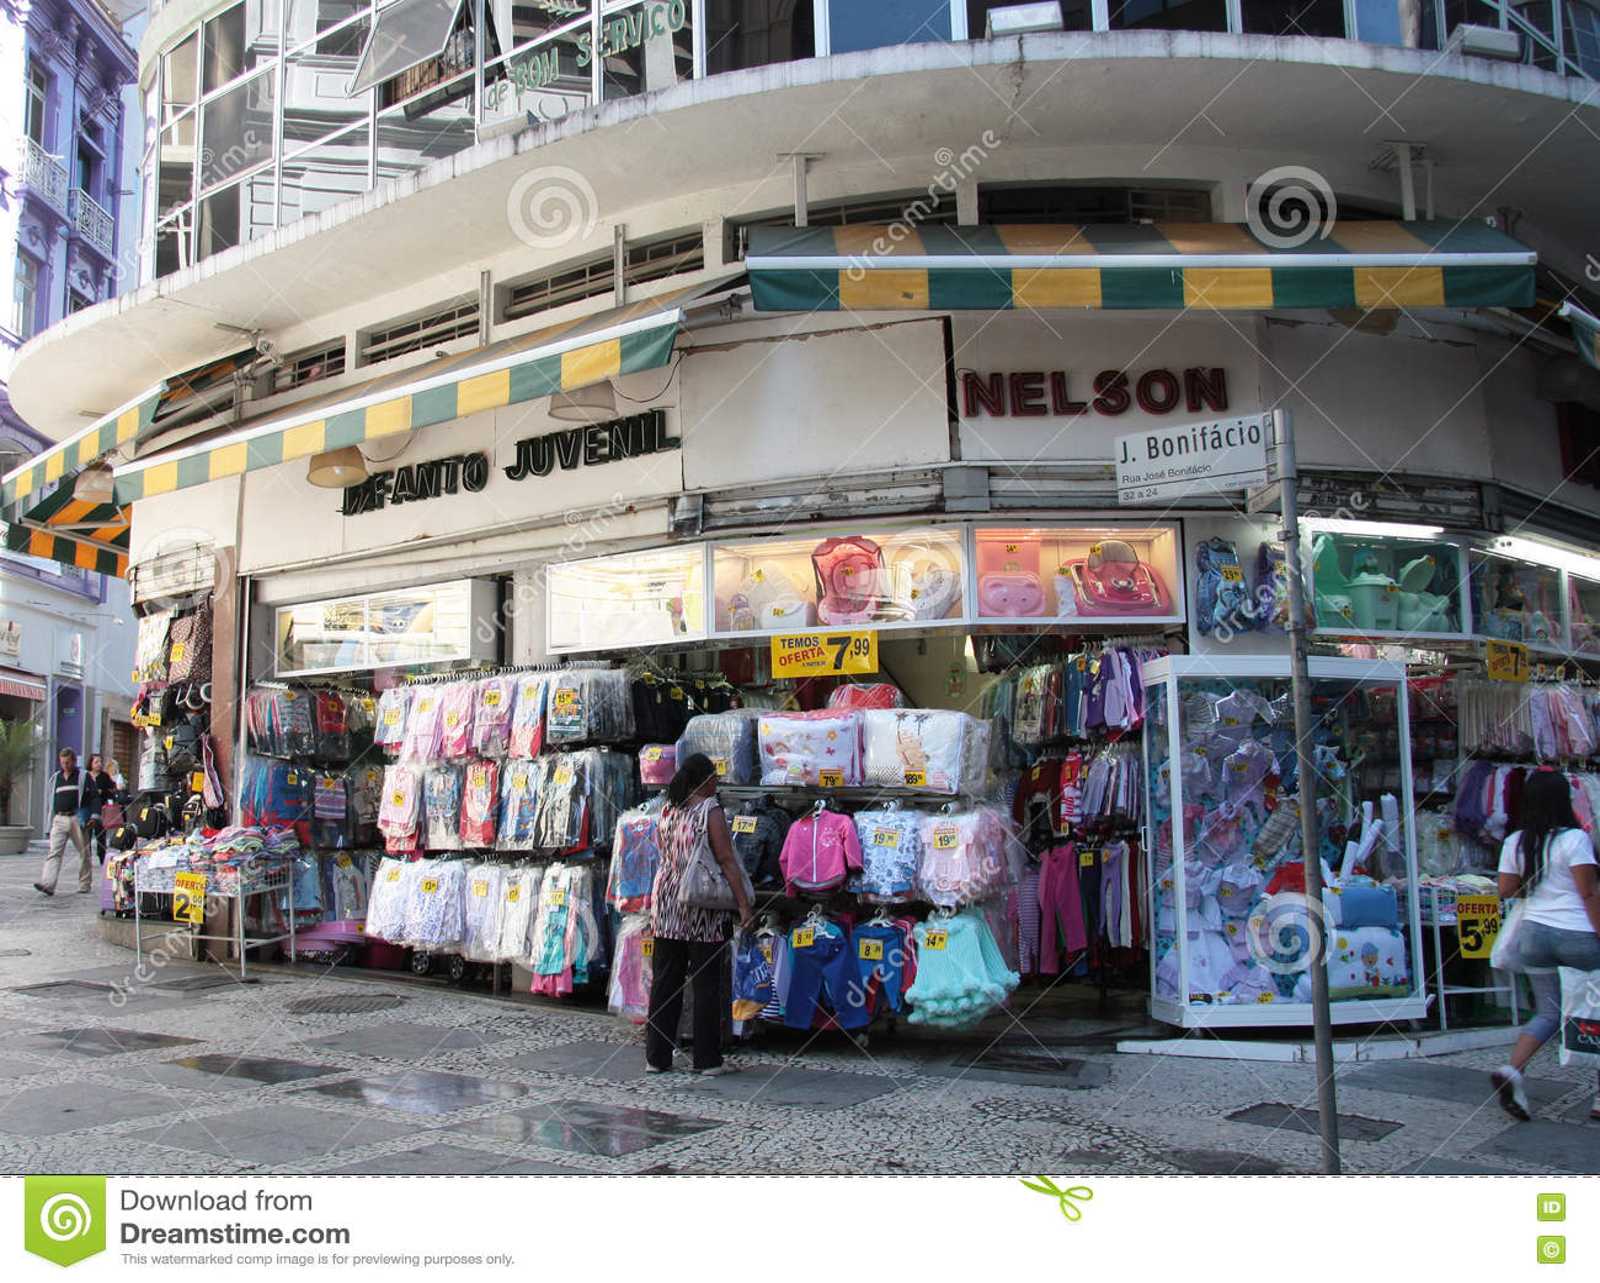 Brazilian clothing stores